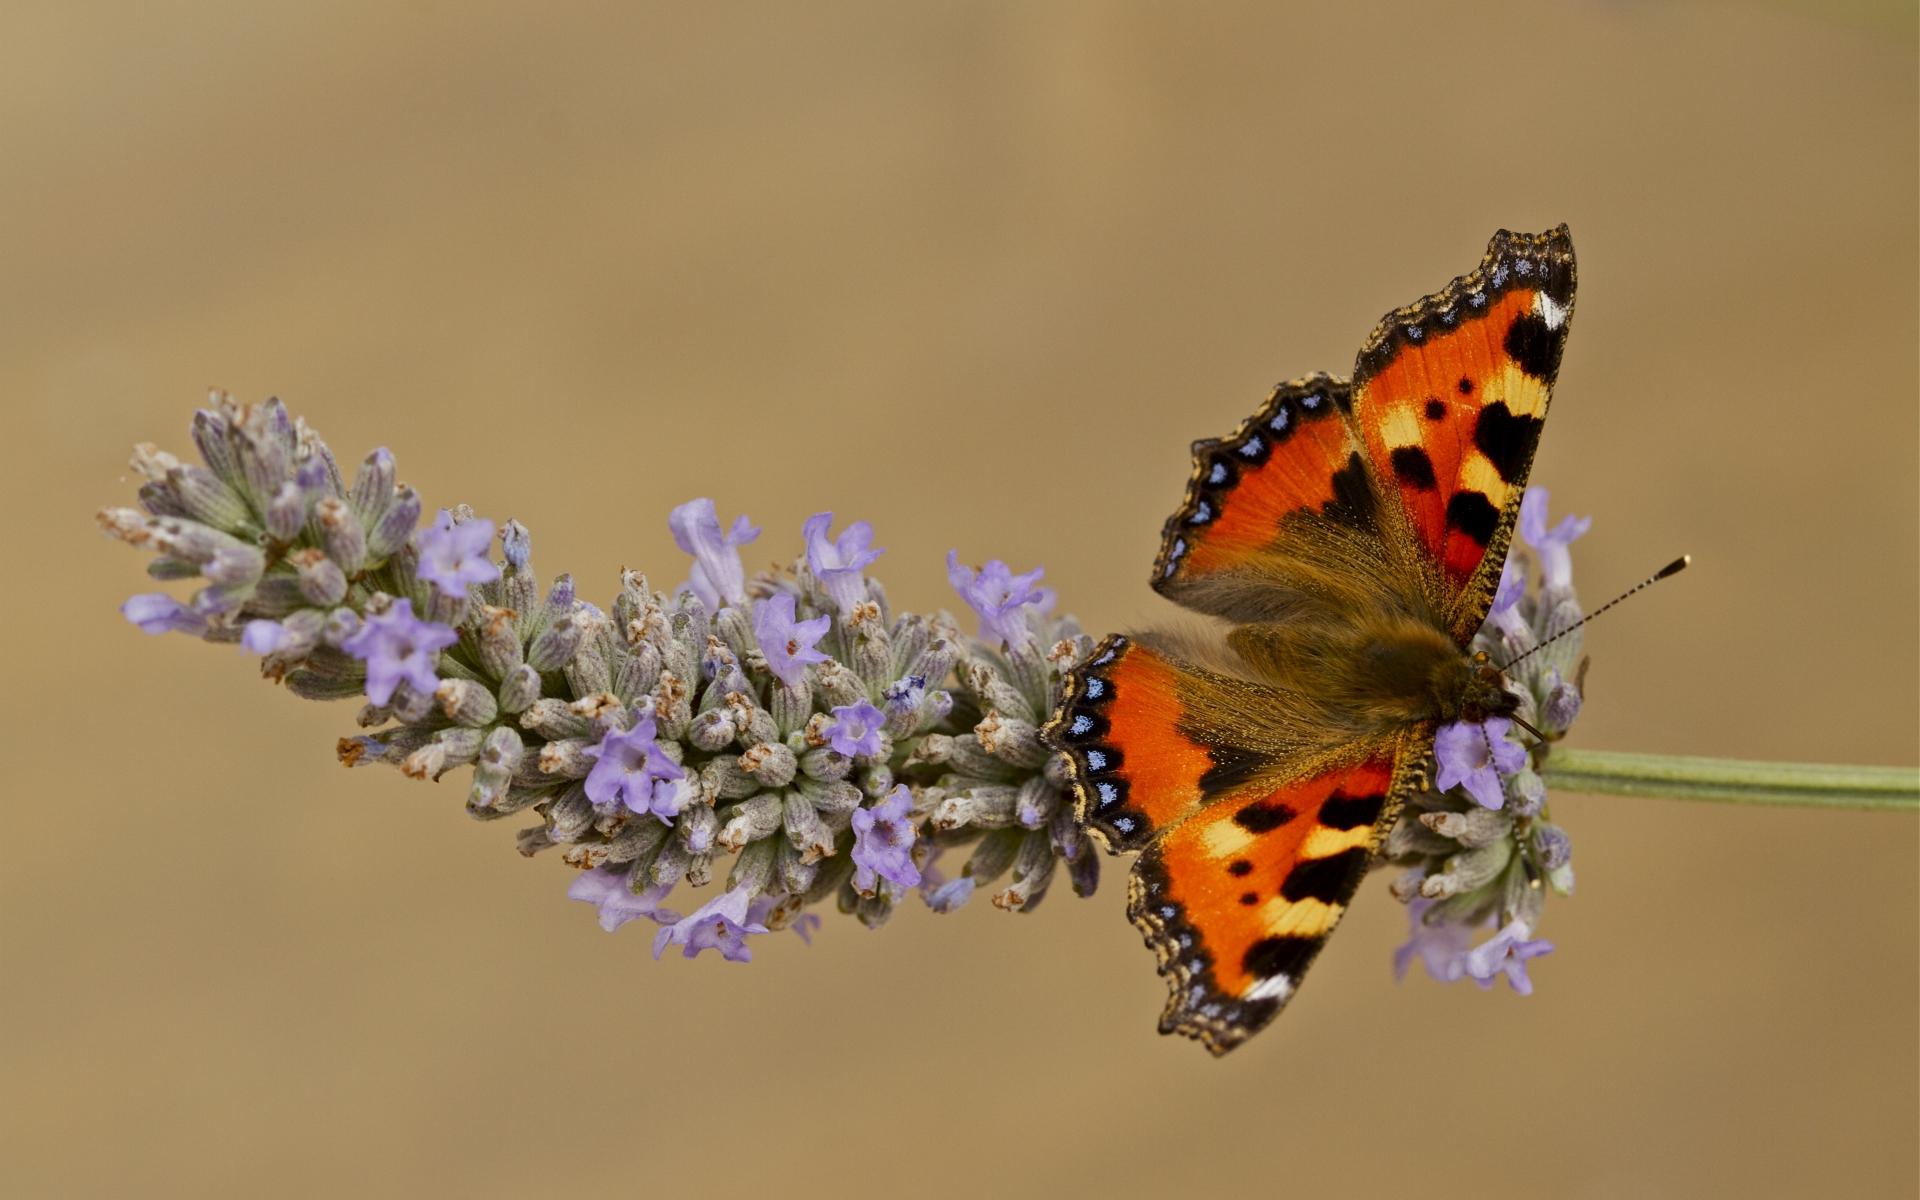 Mariposa color Naranja - 1920x1200